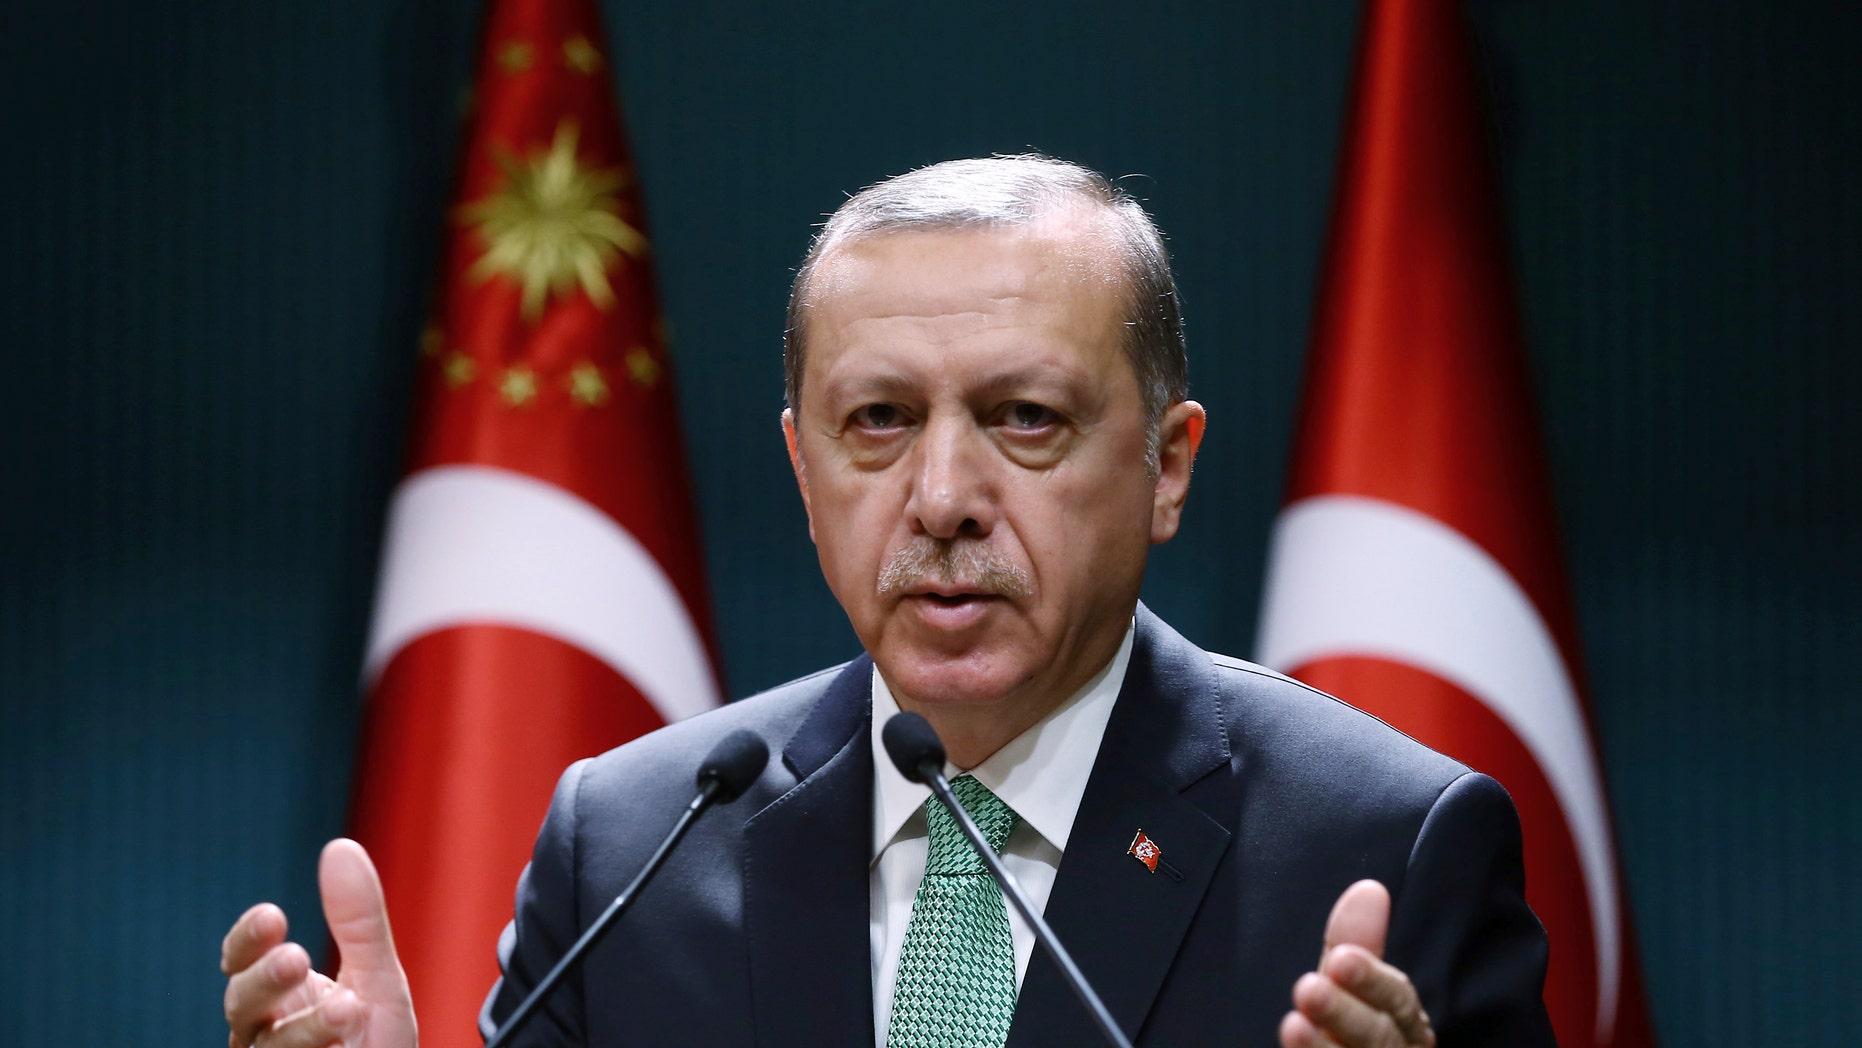 FILE -- Turkey's President Recep Tayyip Erdogan addresses a meeting in Ankara, Turkey.